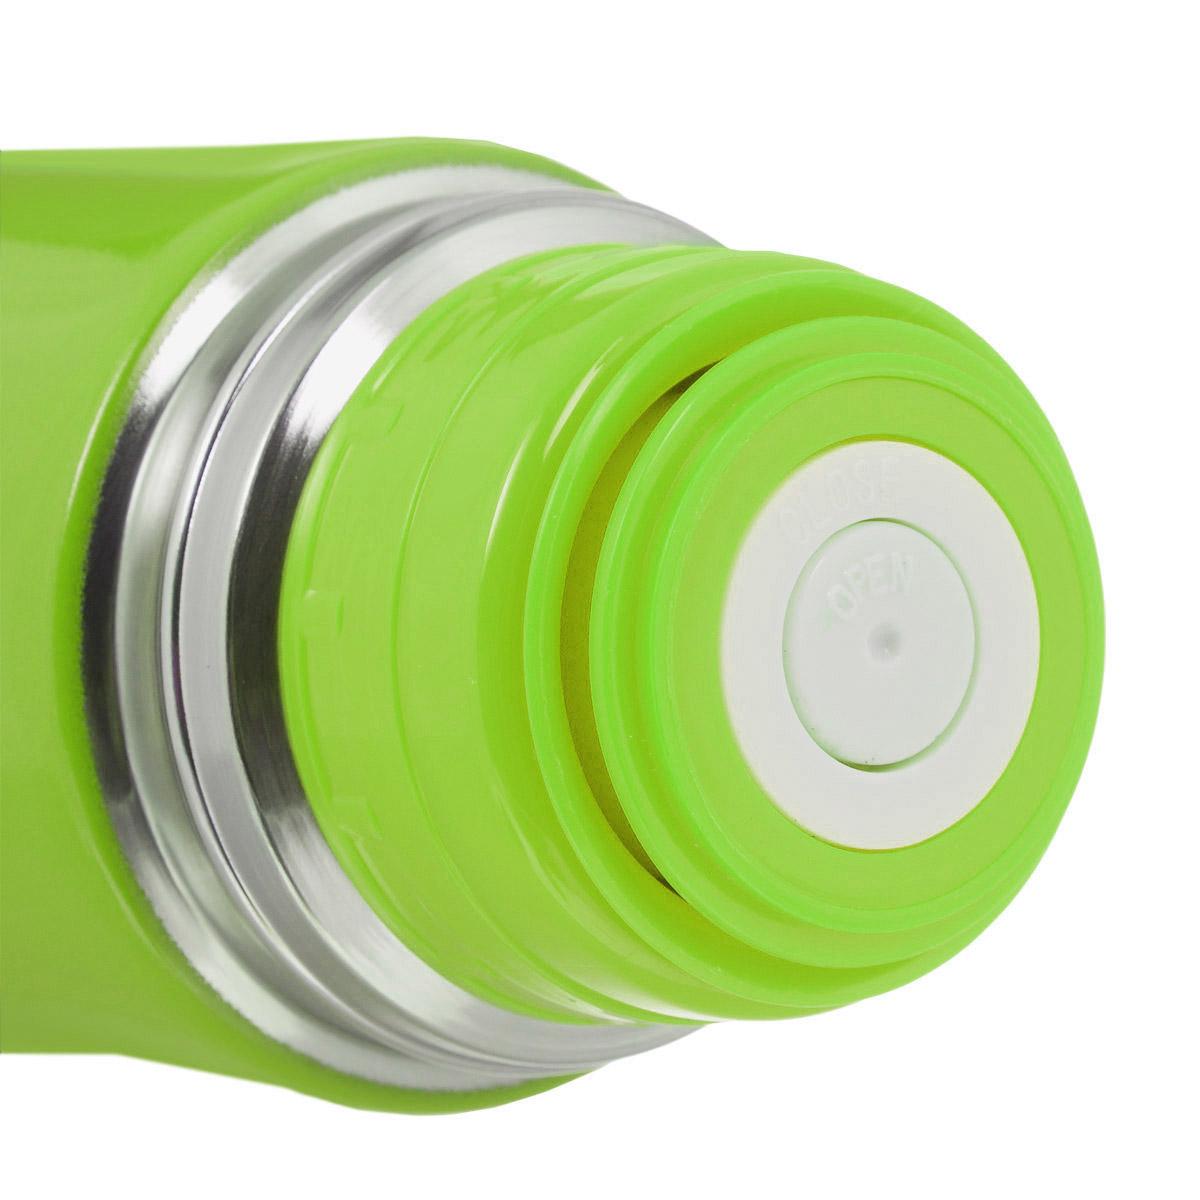 "Термос BIOSTAL ""Fler"", цвет: зеленый, 500 мл. NB-500С-G"